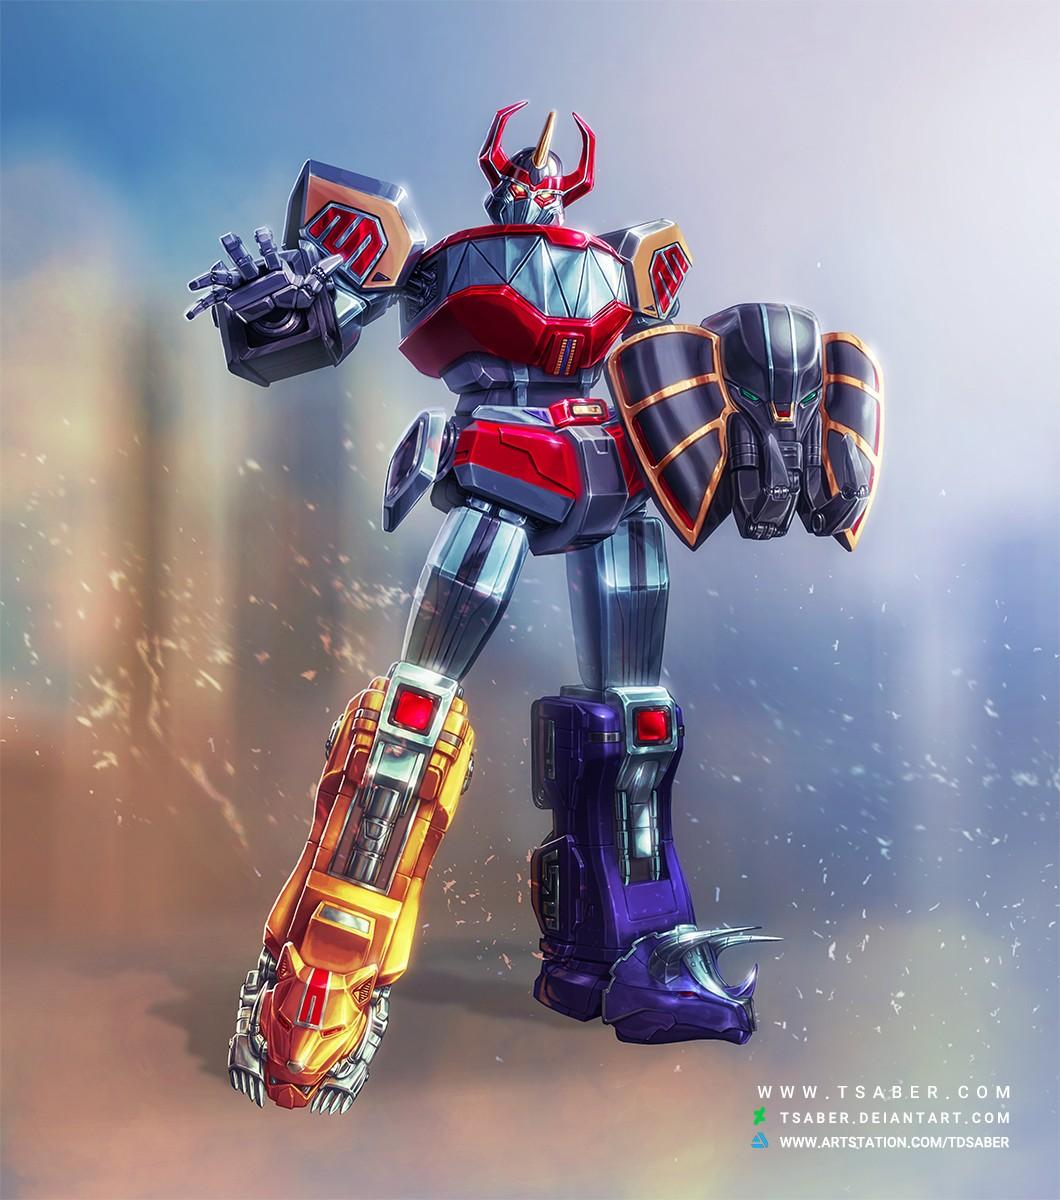 Megazord Mech - Mighty Morphing Power Rangers -Tsaber